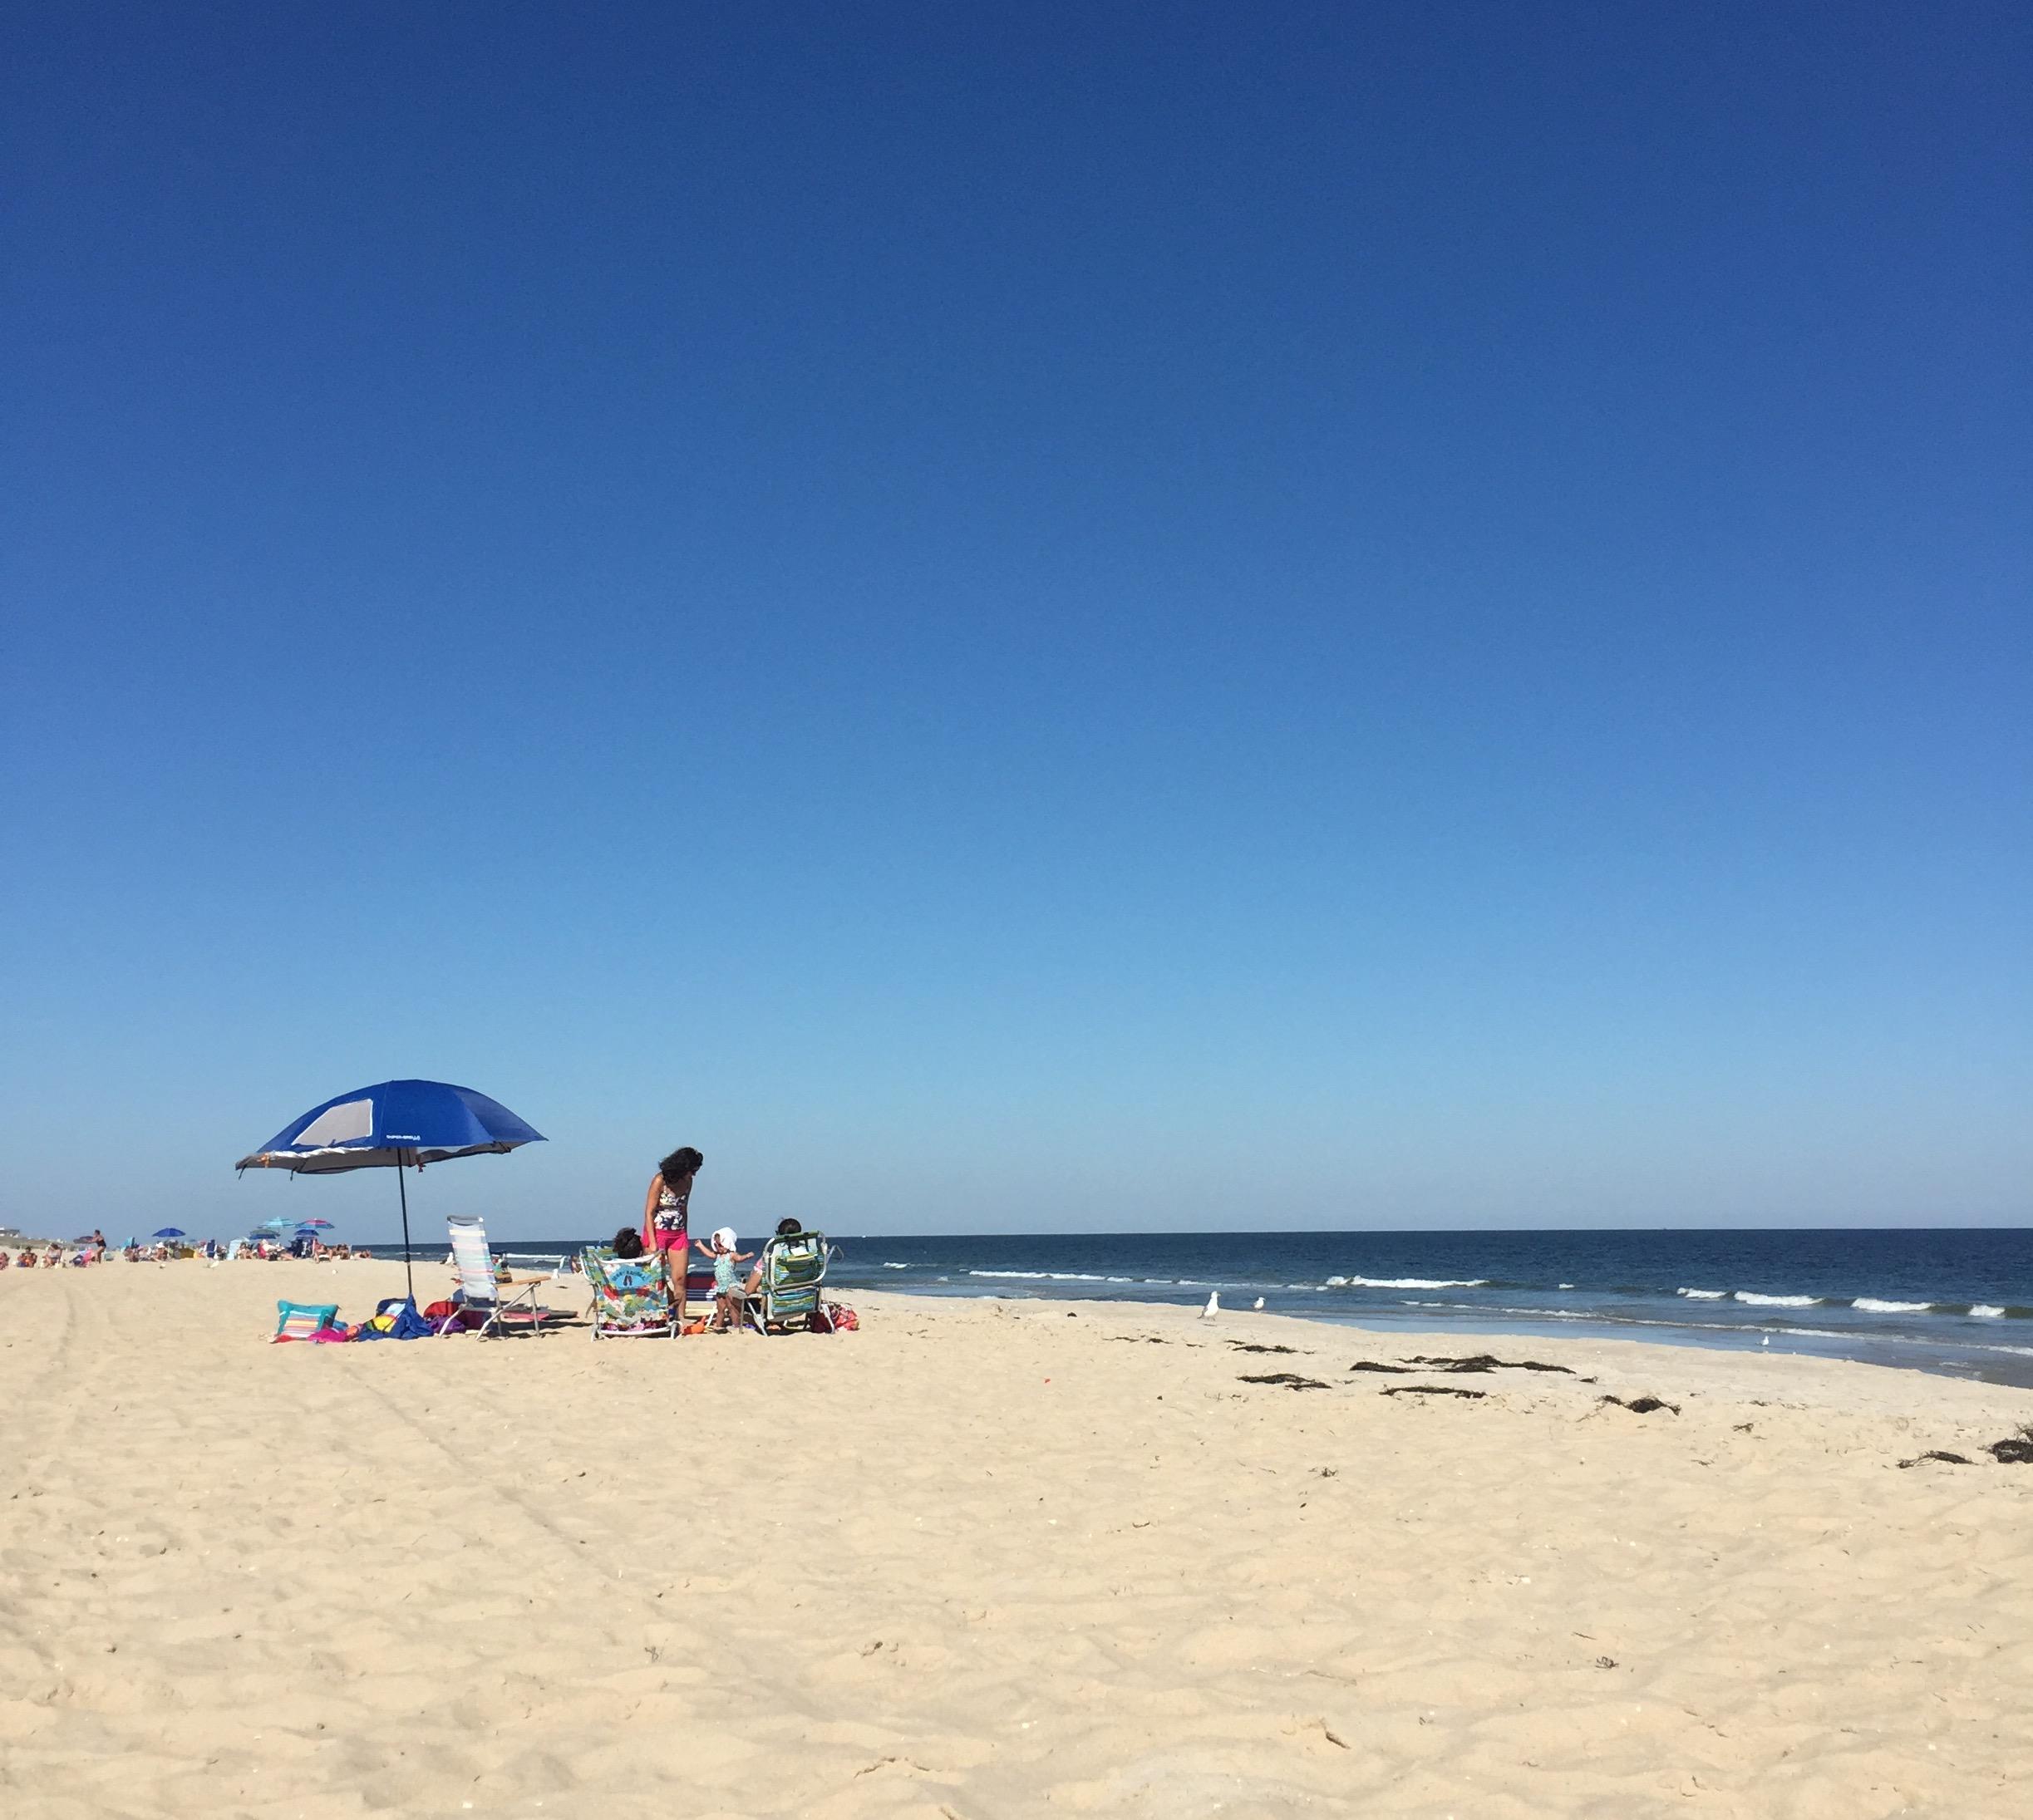 A fall beach scene in New Jersey, 2015. (Photo: Daniel Nee)